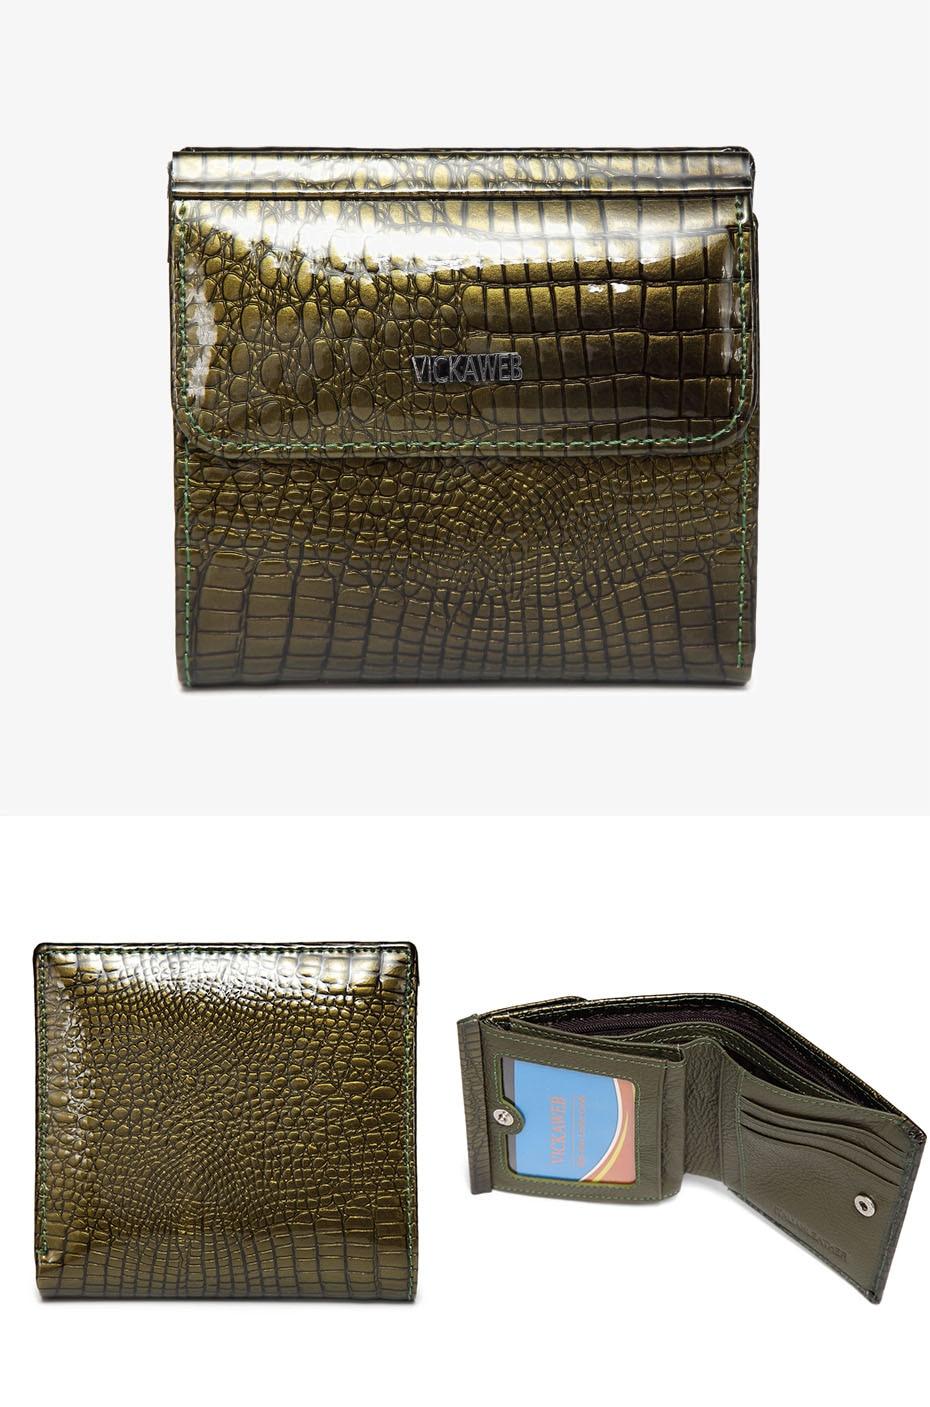 VICKAWEB Mini Wallet Women Genuine Leather Wallets Fashion Alligator Hasp Short Wallet Female Small Woman Wallets And Purses-AE209-020